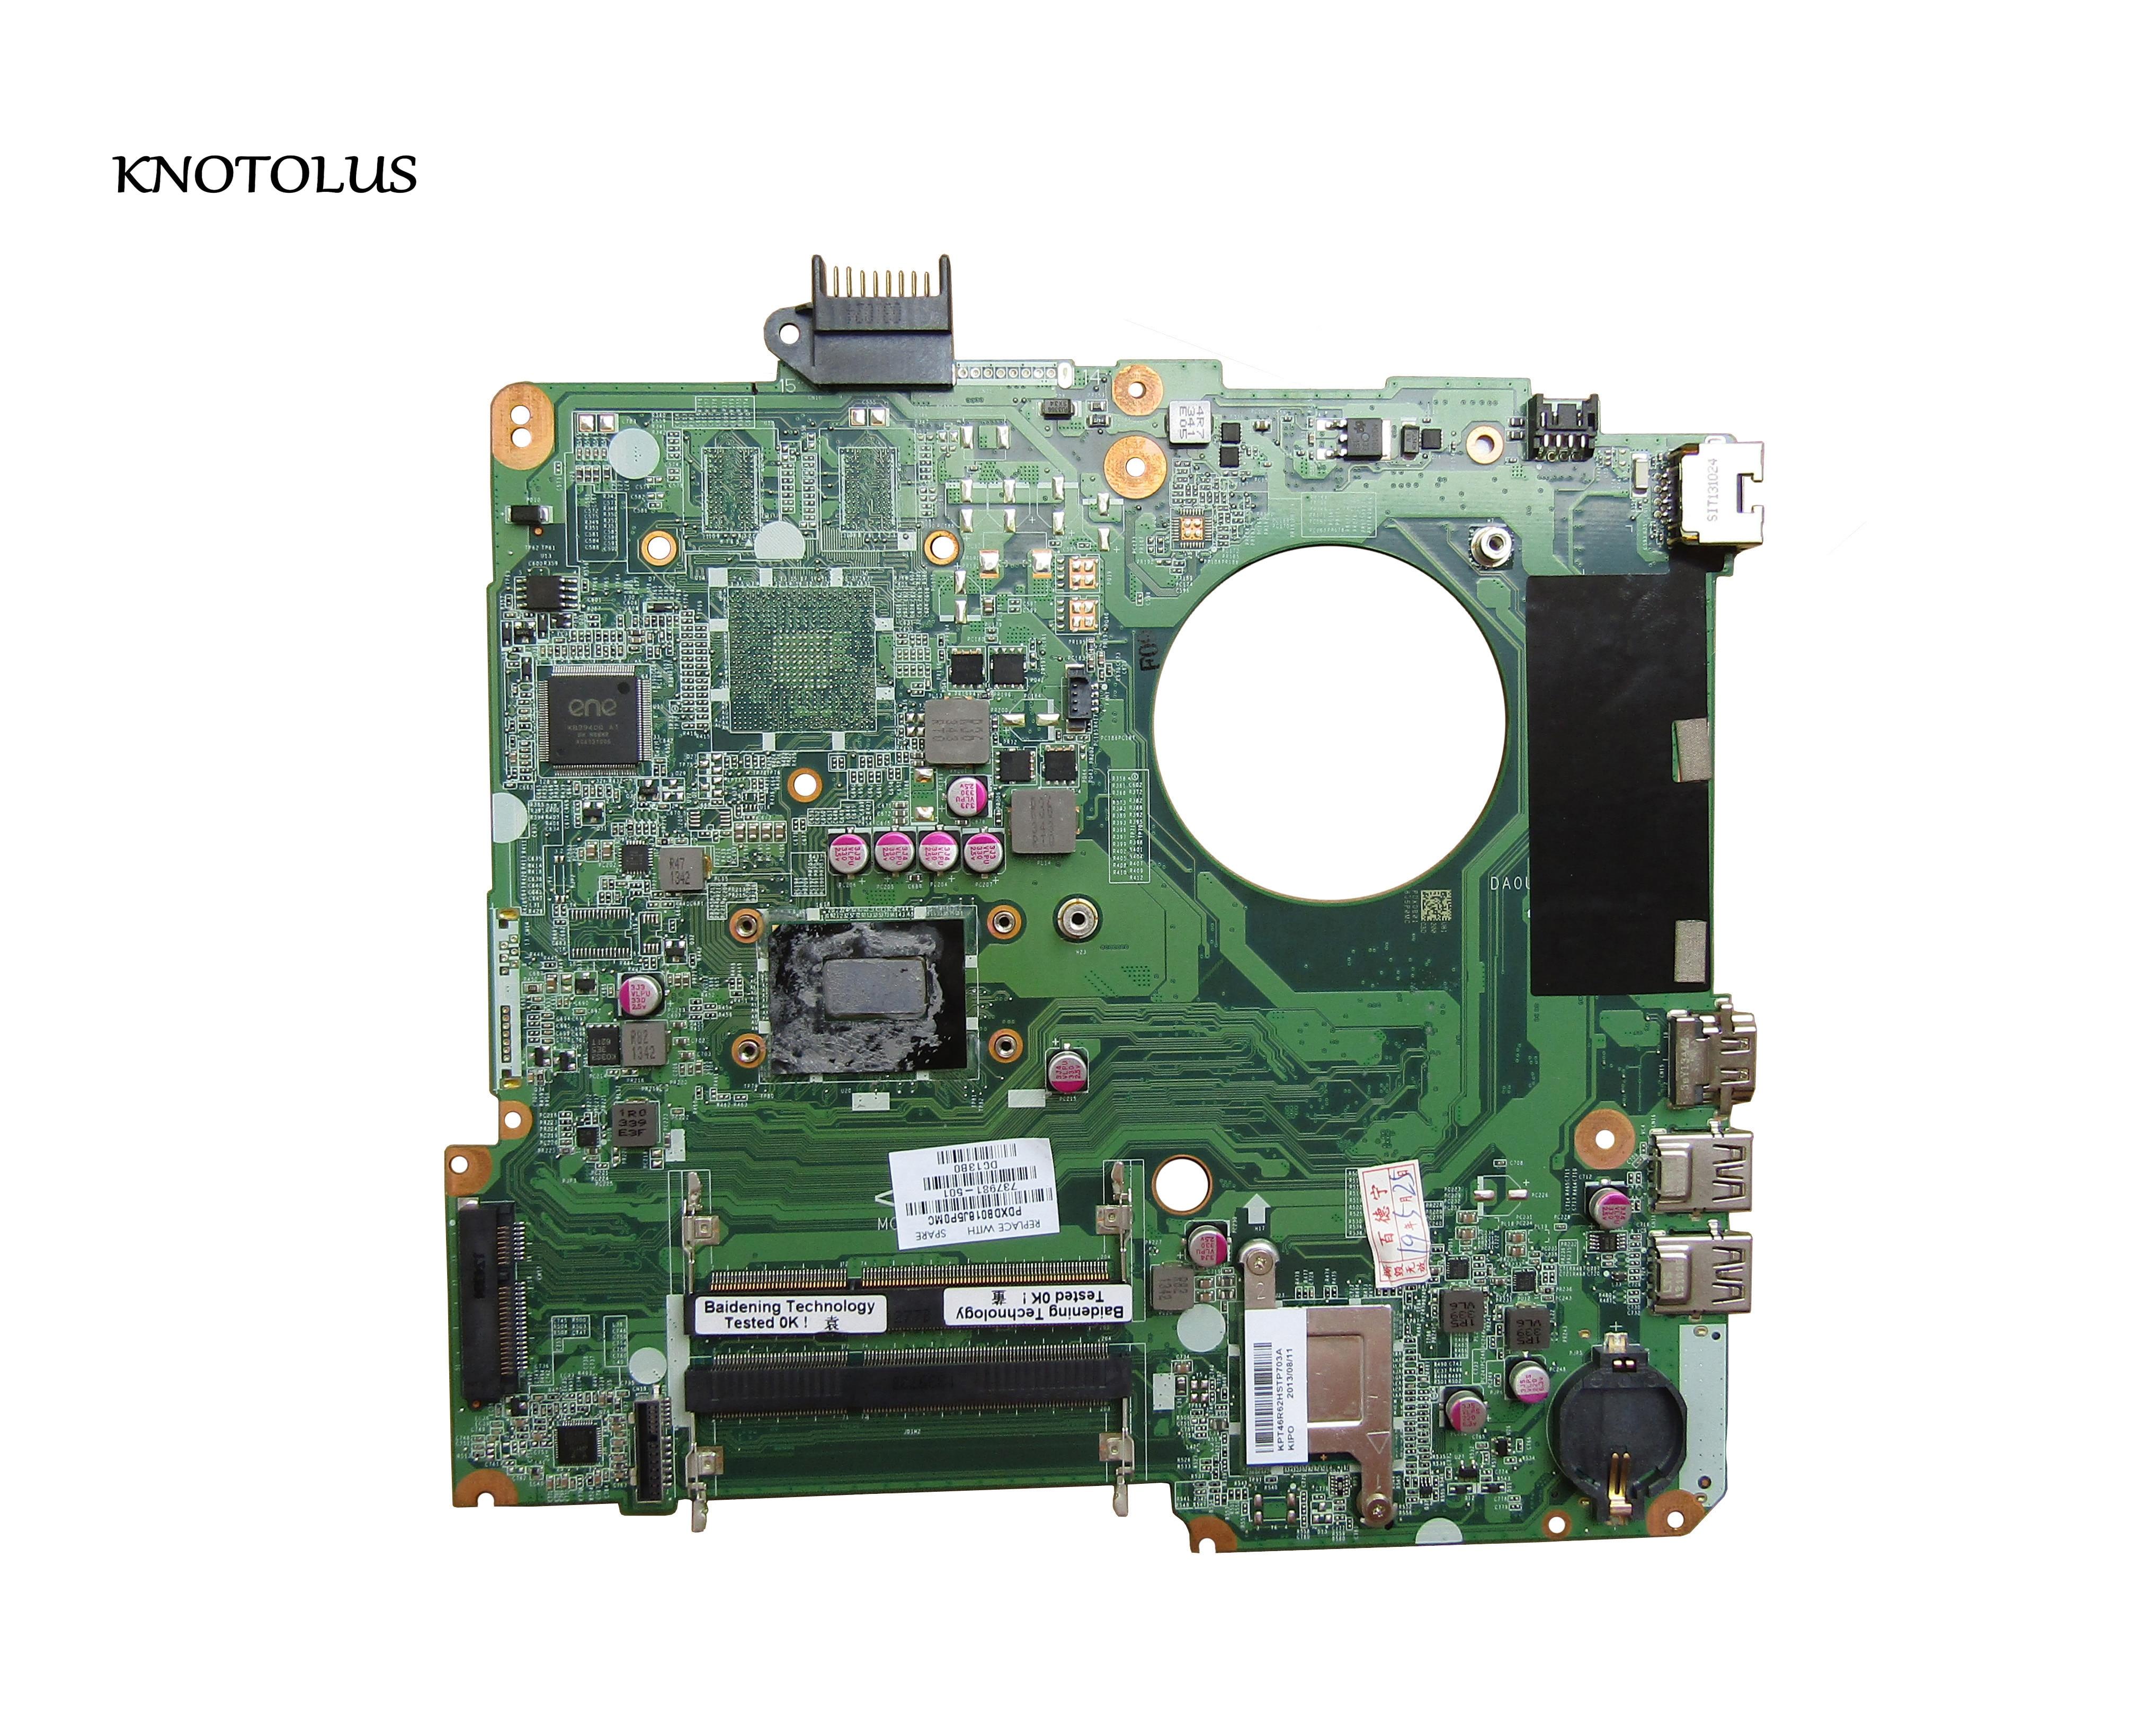 High Quality 737981-501 737981-001 737981-601 For Hp Pavilion 15-N Laptop Motherbroard DA0U81MB6C0 HM76 1007u 100% Fully Tested